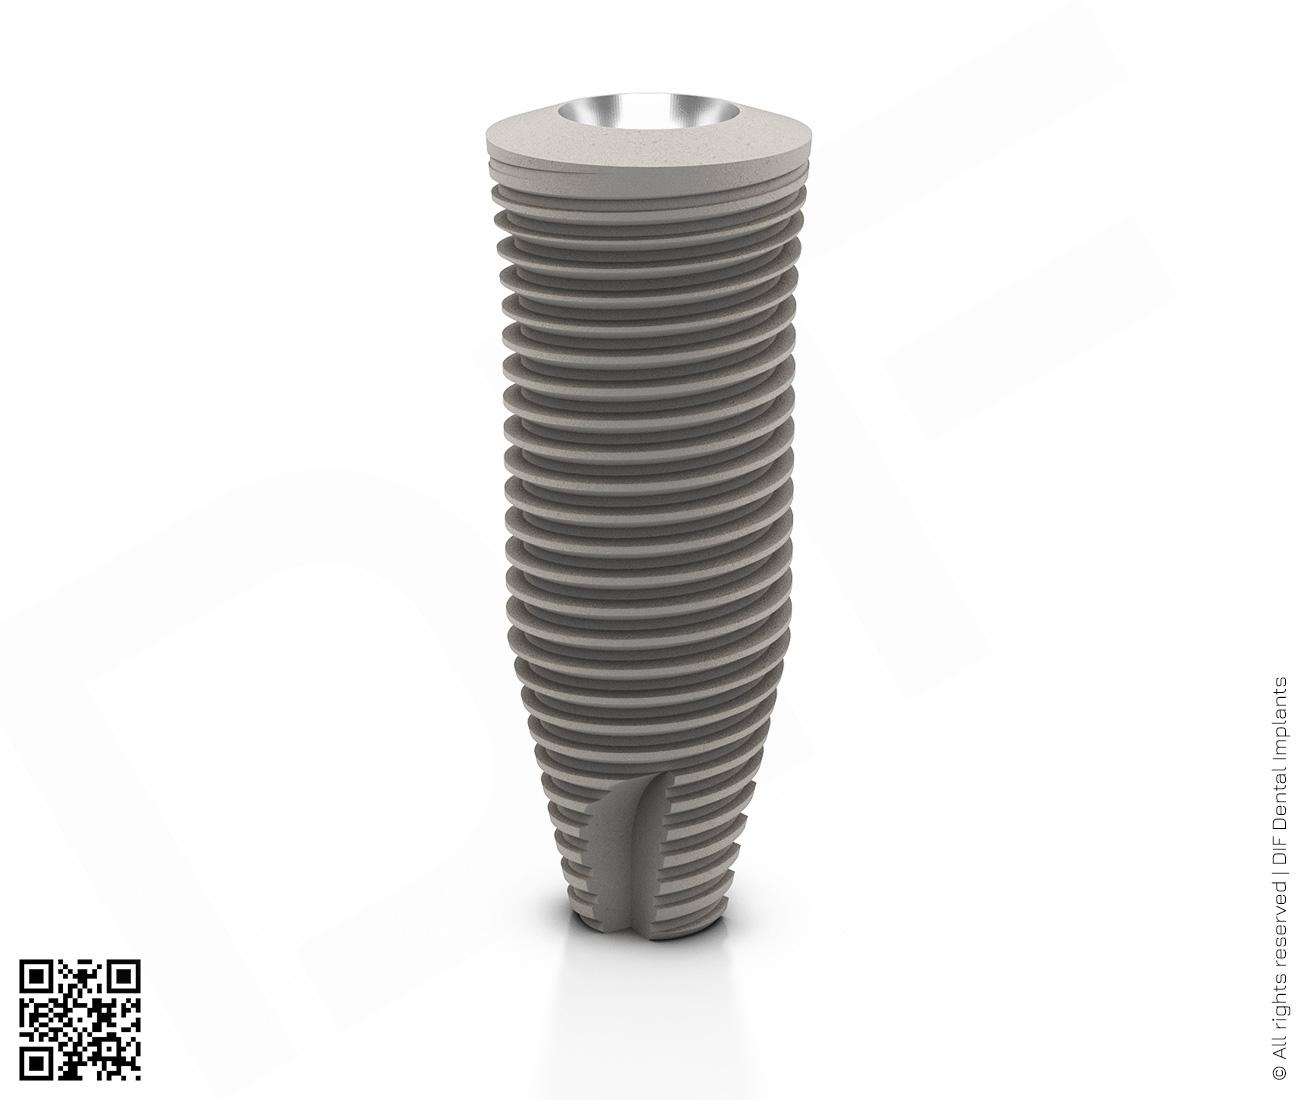 Фото имплантат mainstream fine d6.0 мм – l16.0 мм  производства DIF.